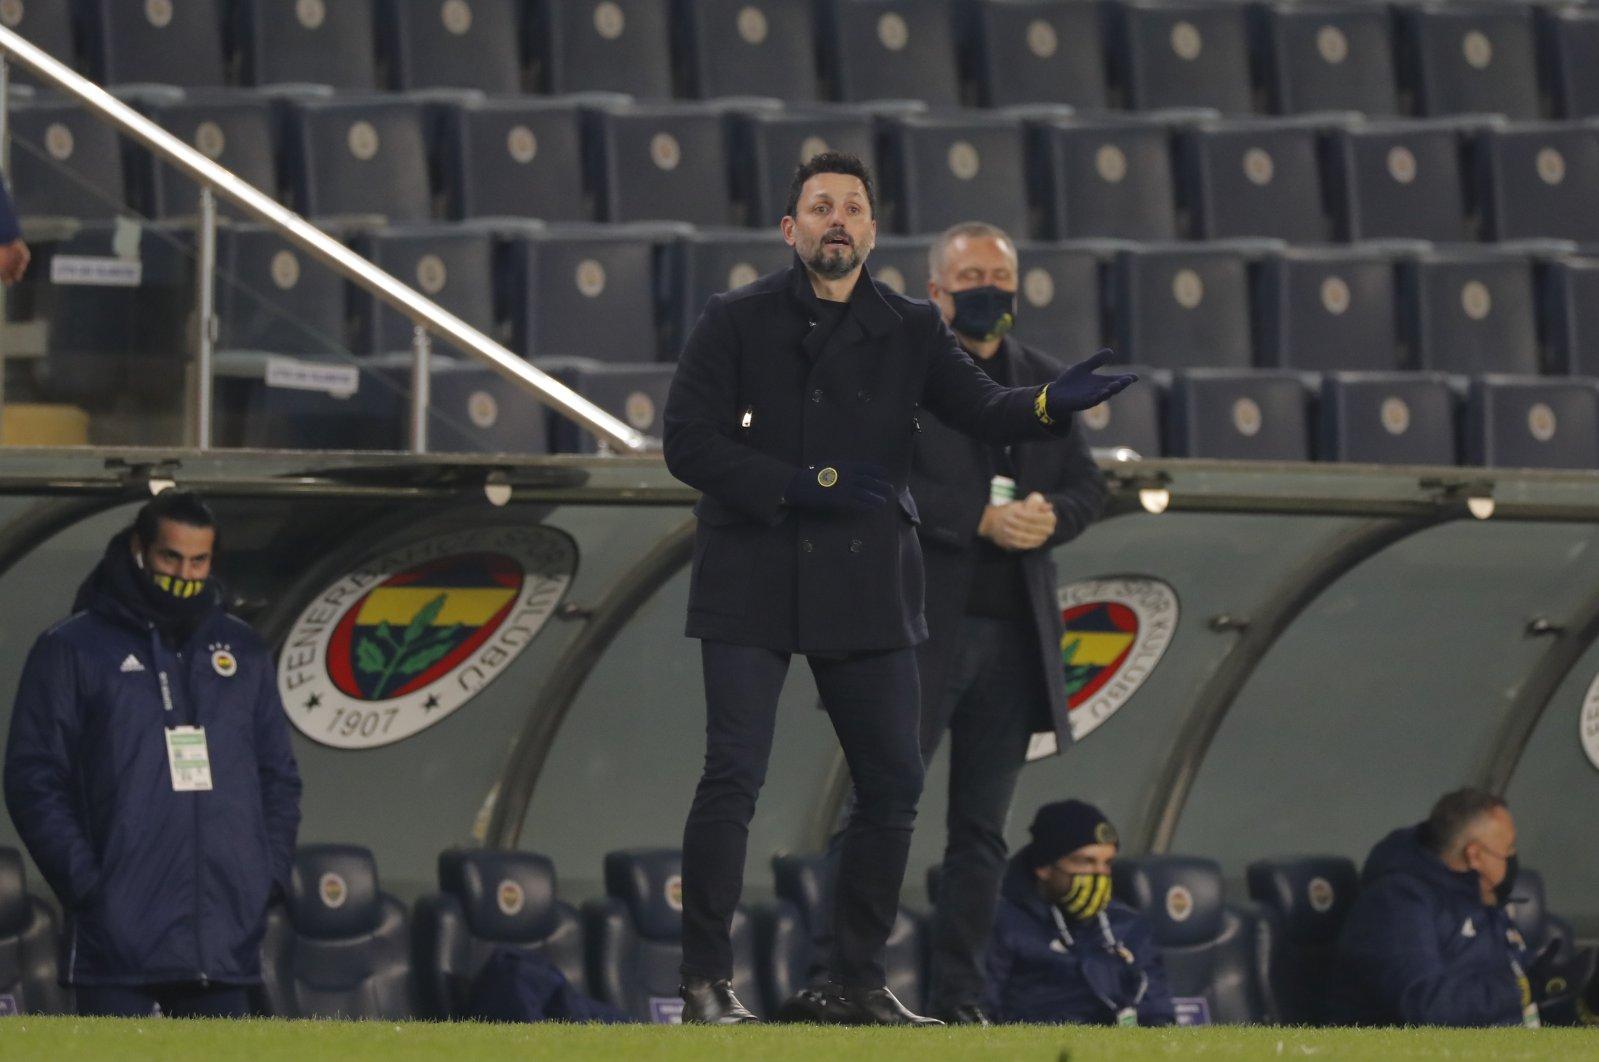 Fenerbahçe's head coach Erol Bulut during a Turkish Super League soccer match between Fenerbahçe and Ankaragücü in Istanbul, Monday, Jan. 18, 2021. (AP Photo)